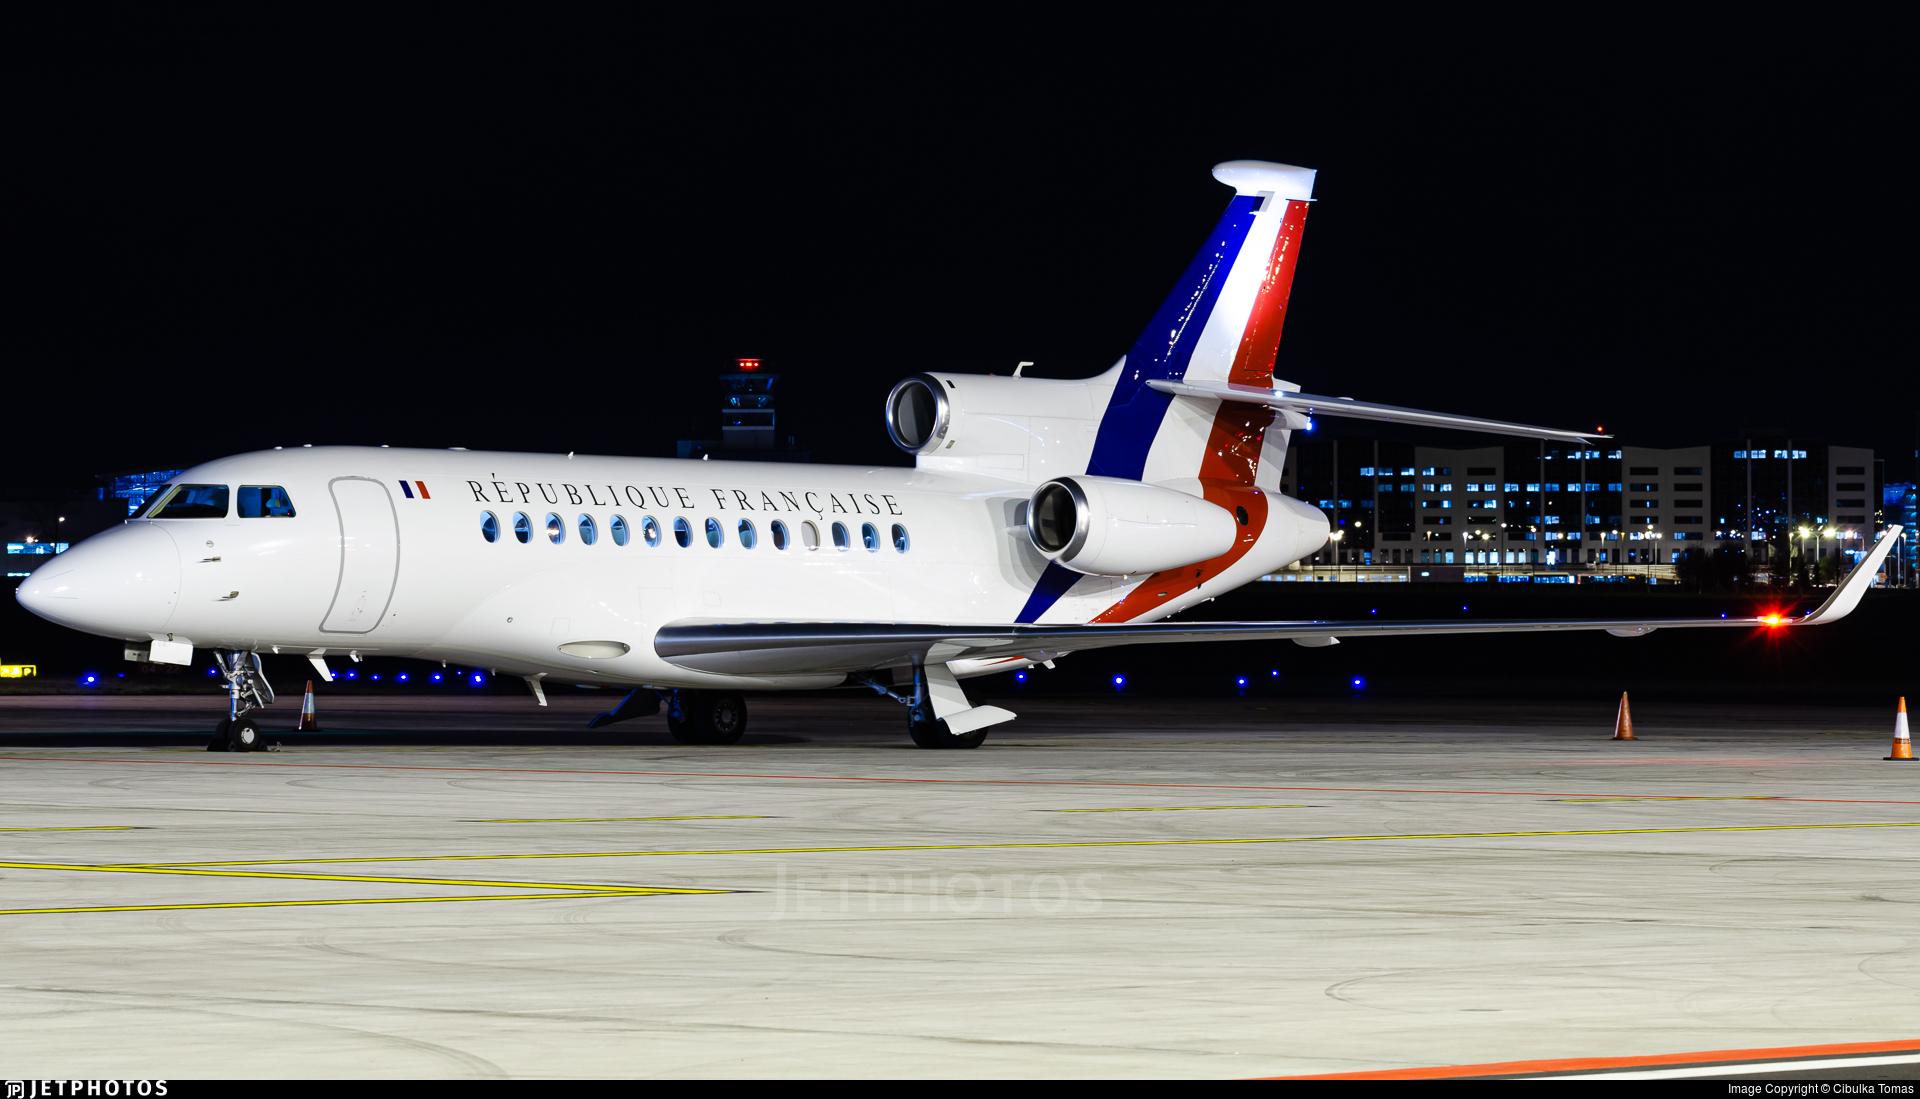 68 - Dassault Falcon 7X - France - Air Force